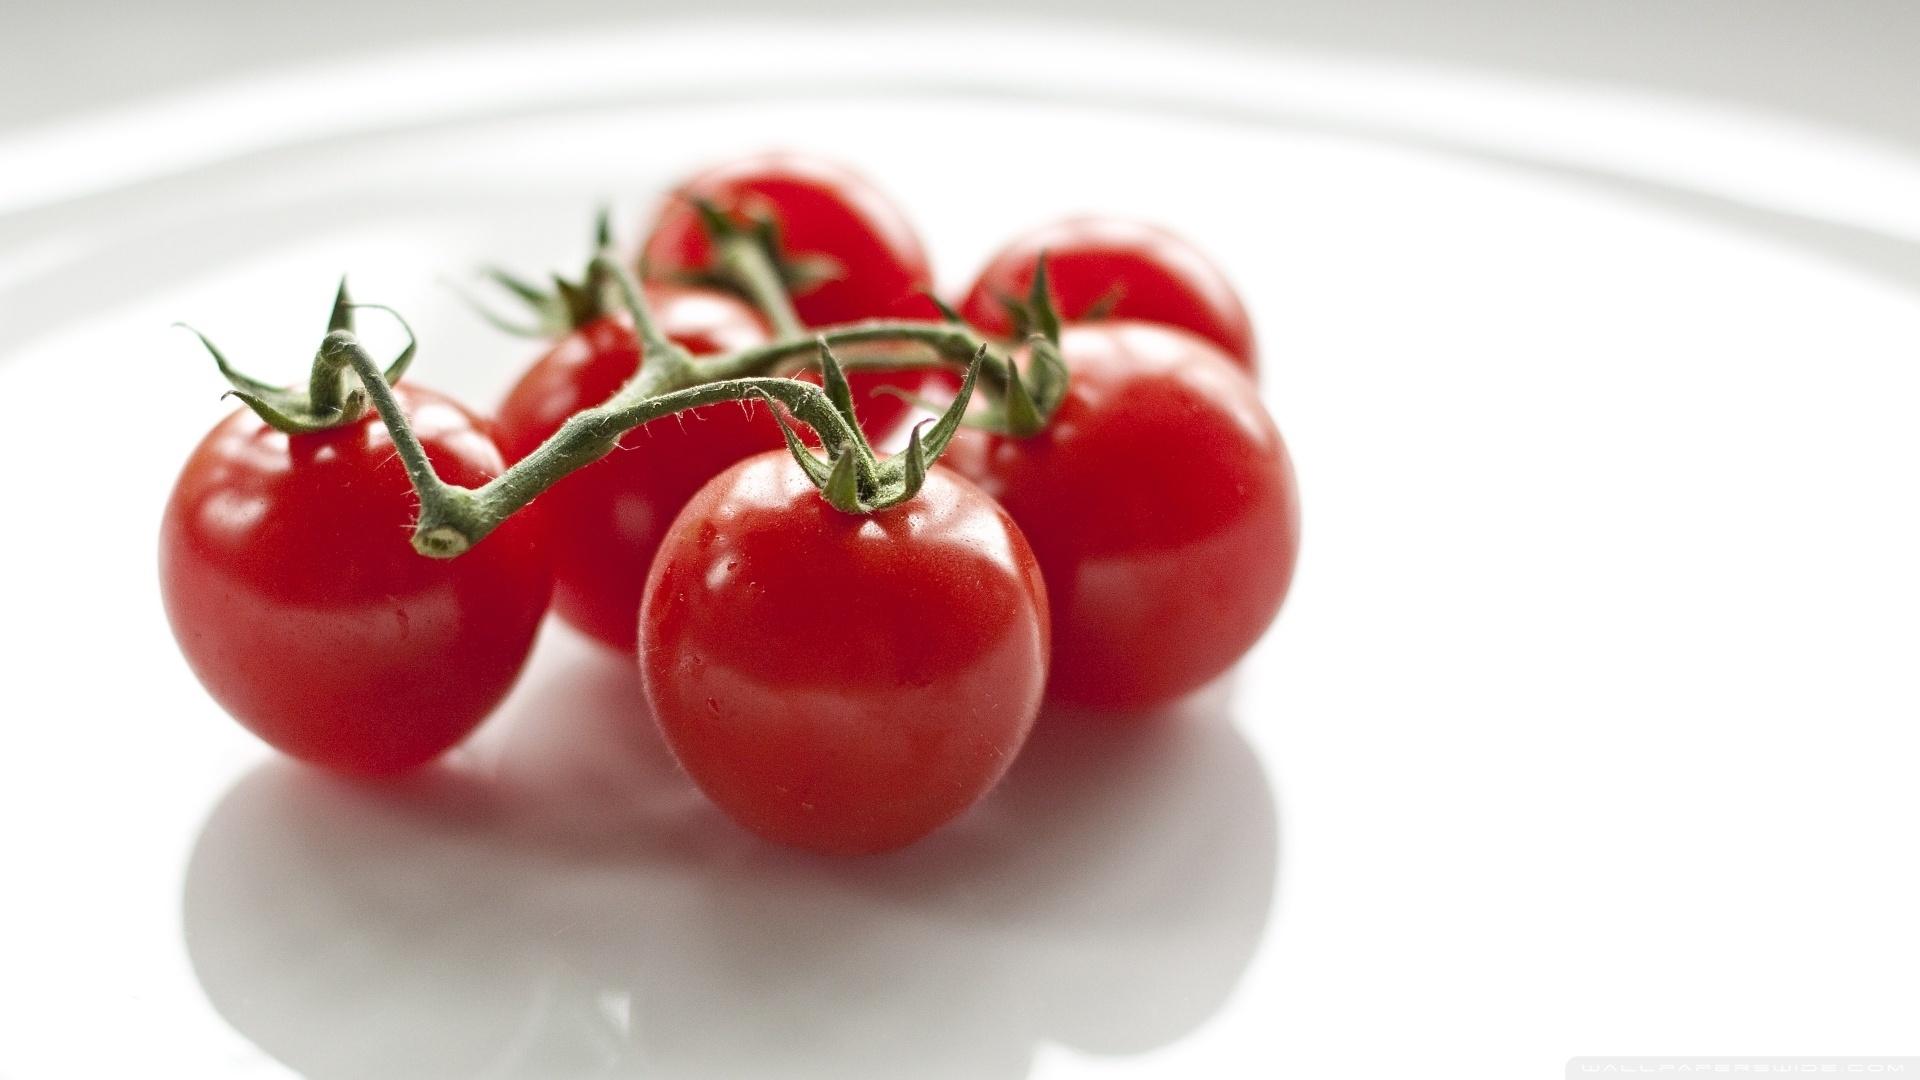 Tomatoes hd desktop wallpaper